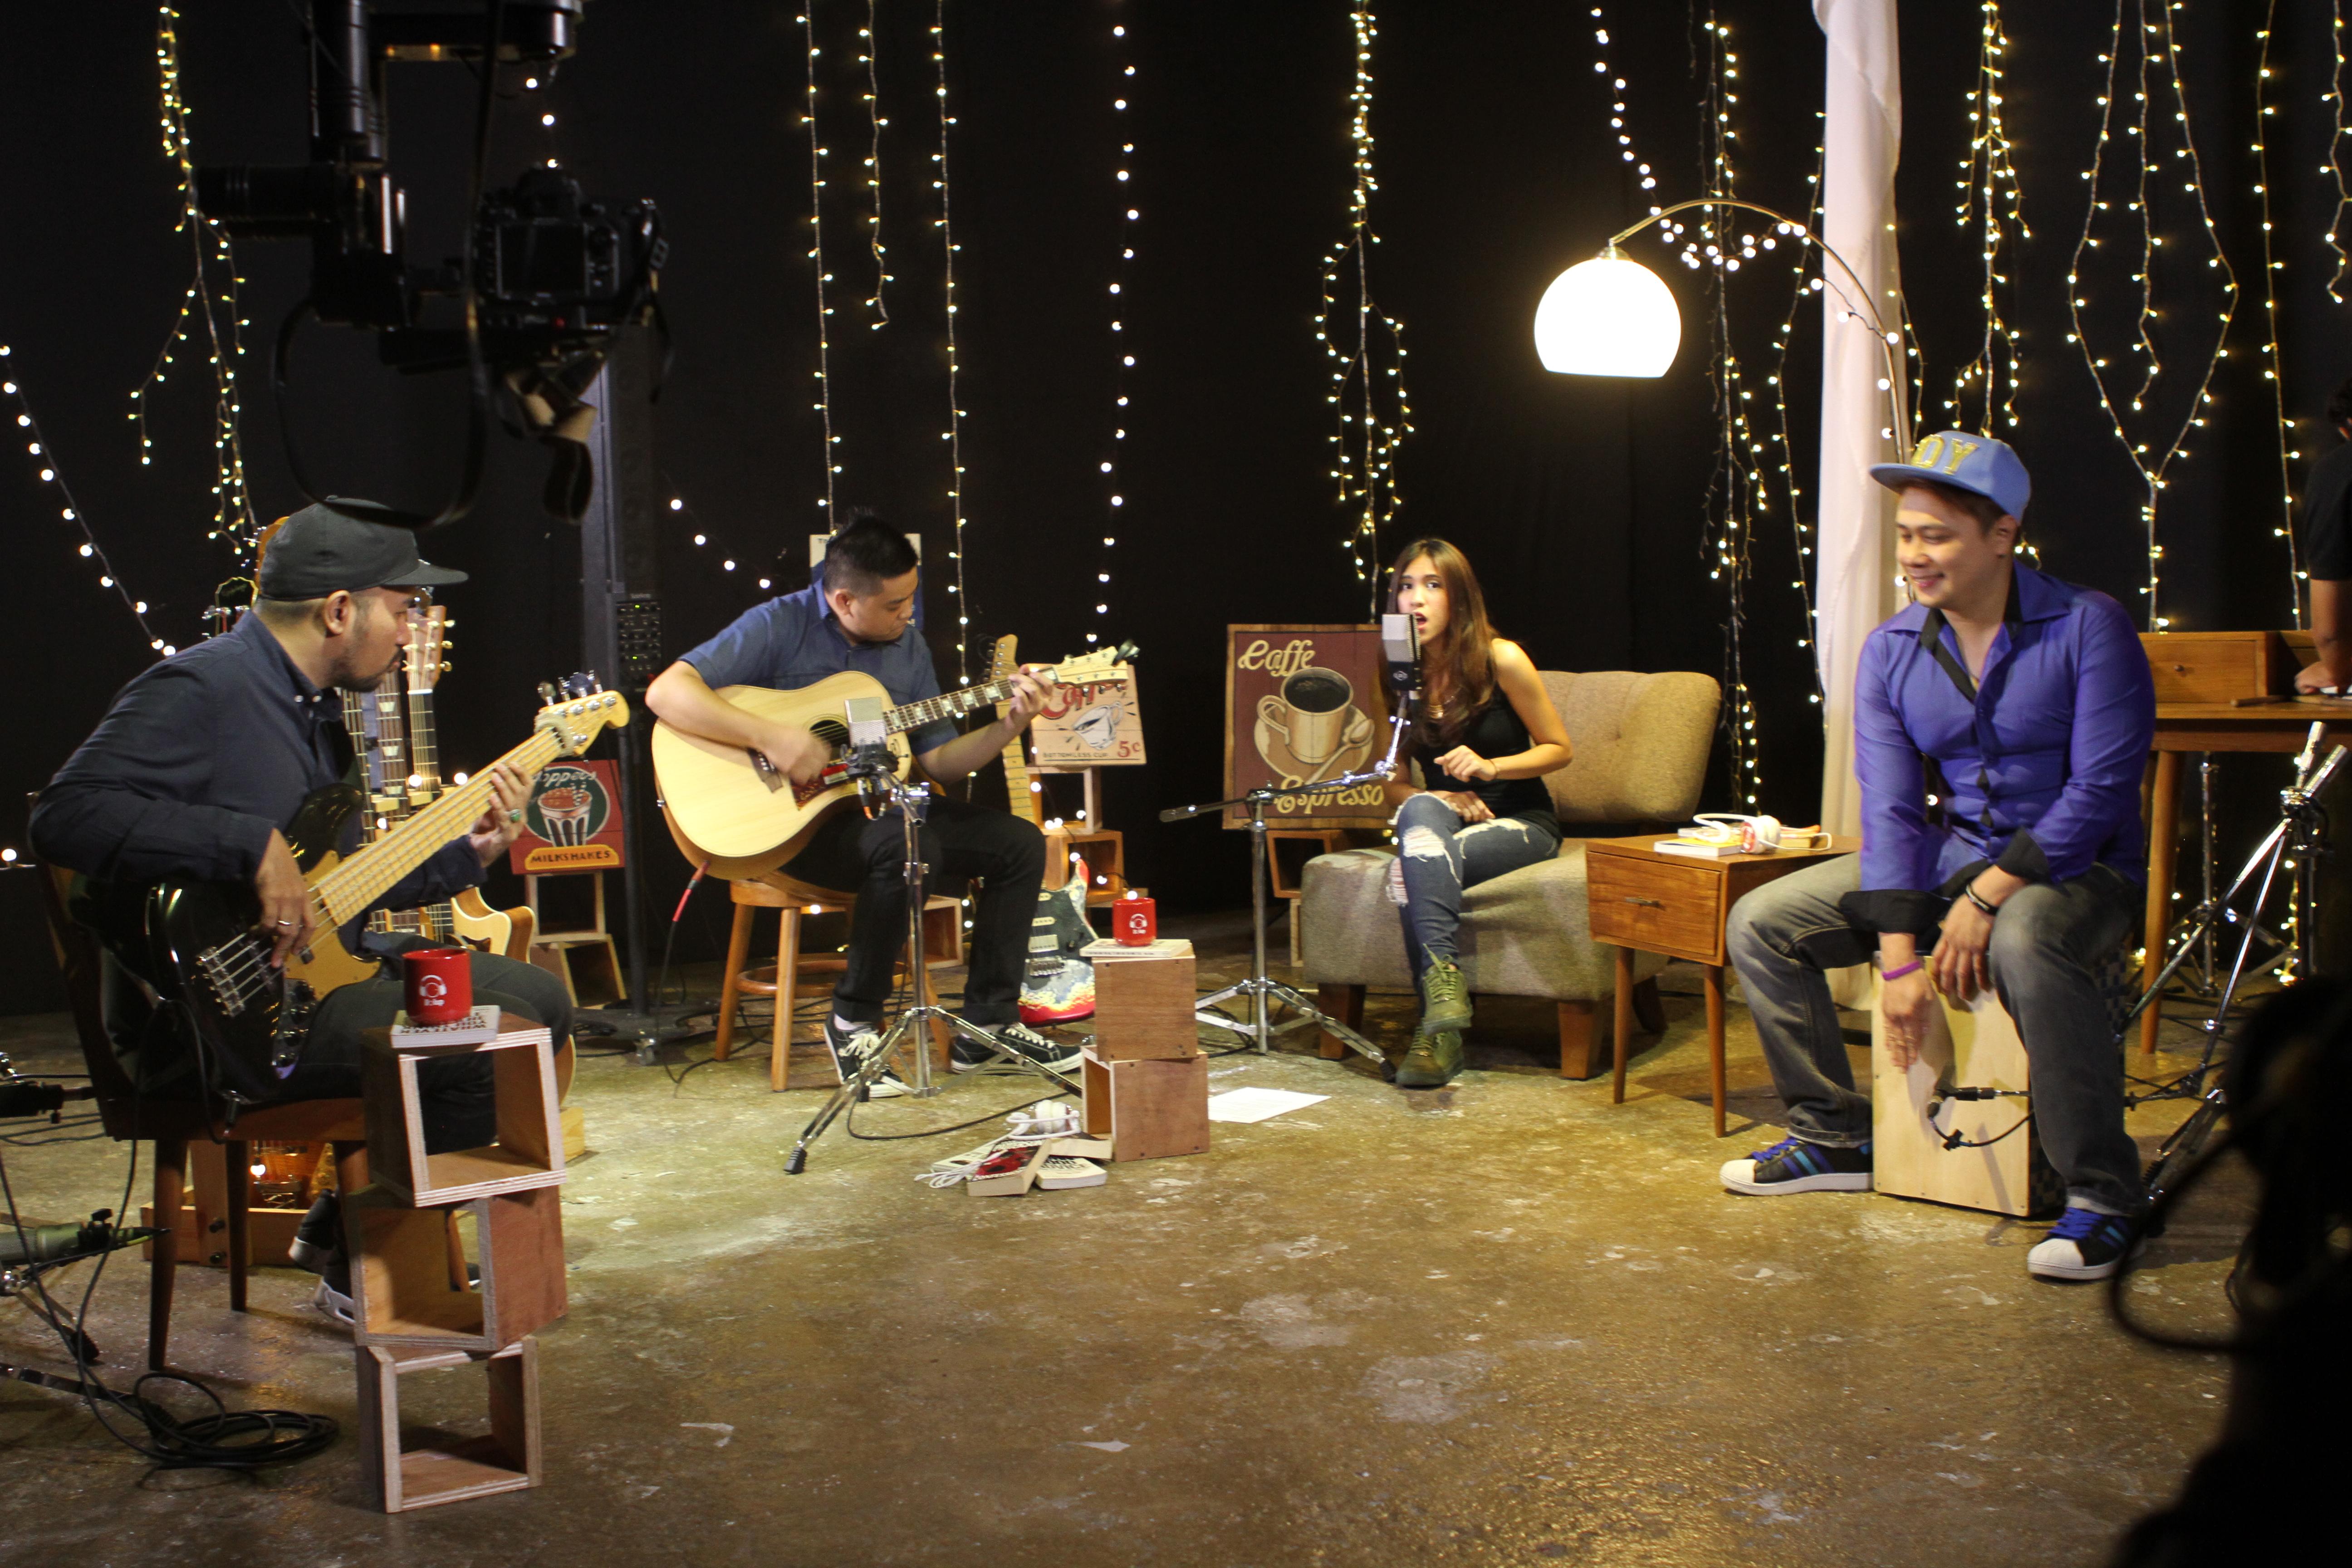 Mimpi Kalista Jadi Penyanyi Terkabul Gara-Gara Bolos Sekolah, Kok Bisa?